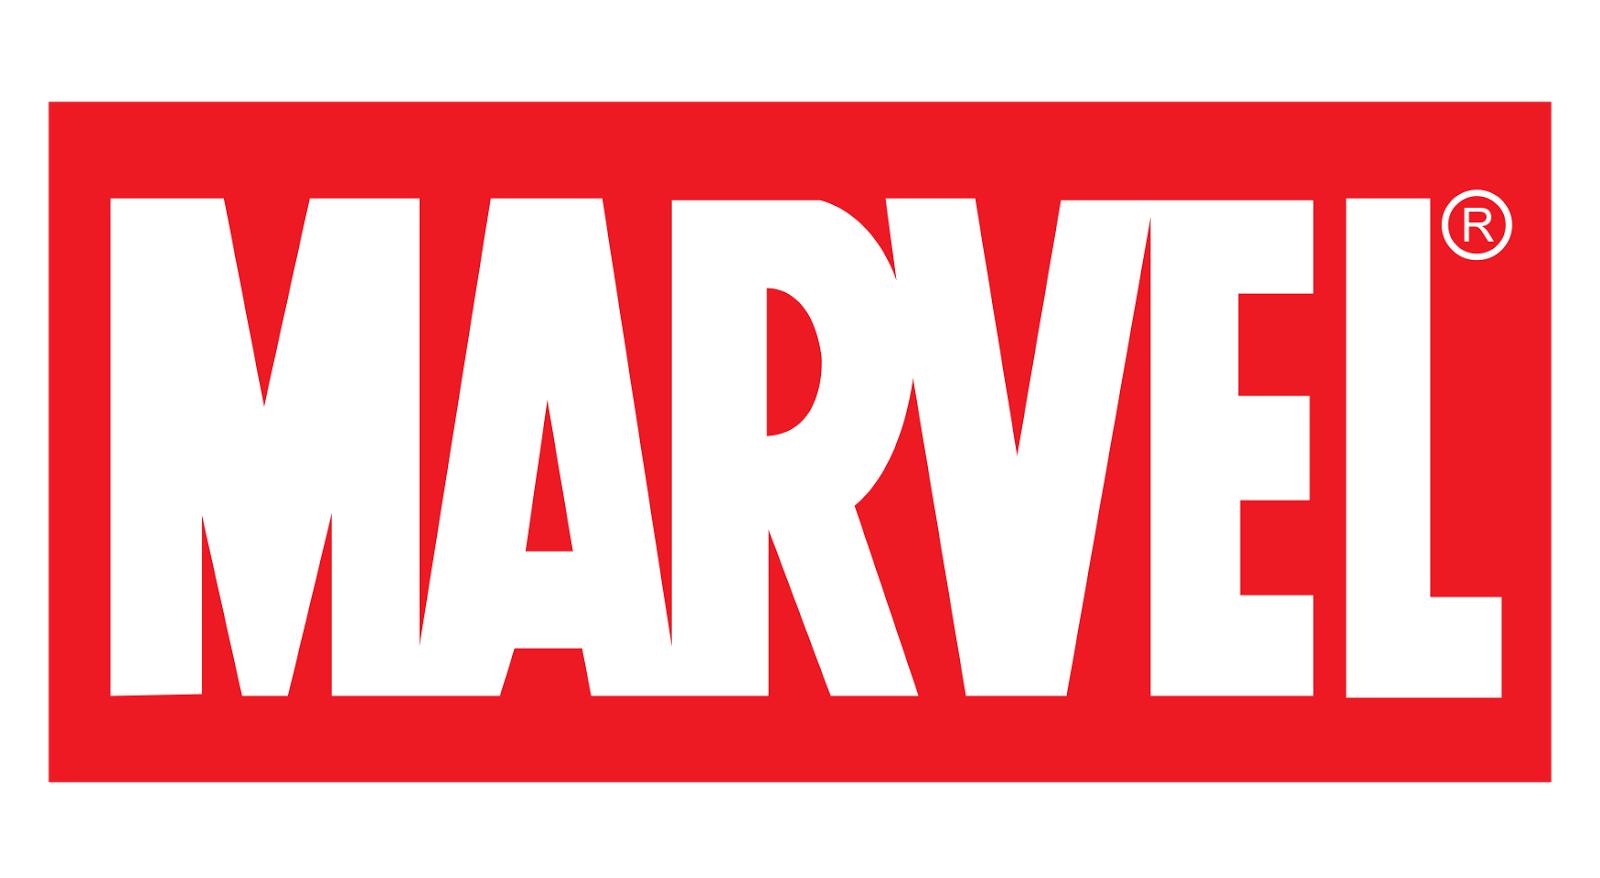 5 kostenlose digitale Marvel Comic (z.B: Venom, Hulk oder Spiderman) @ Marvel.com